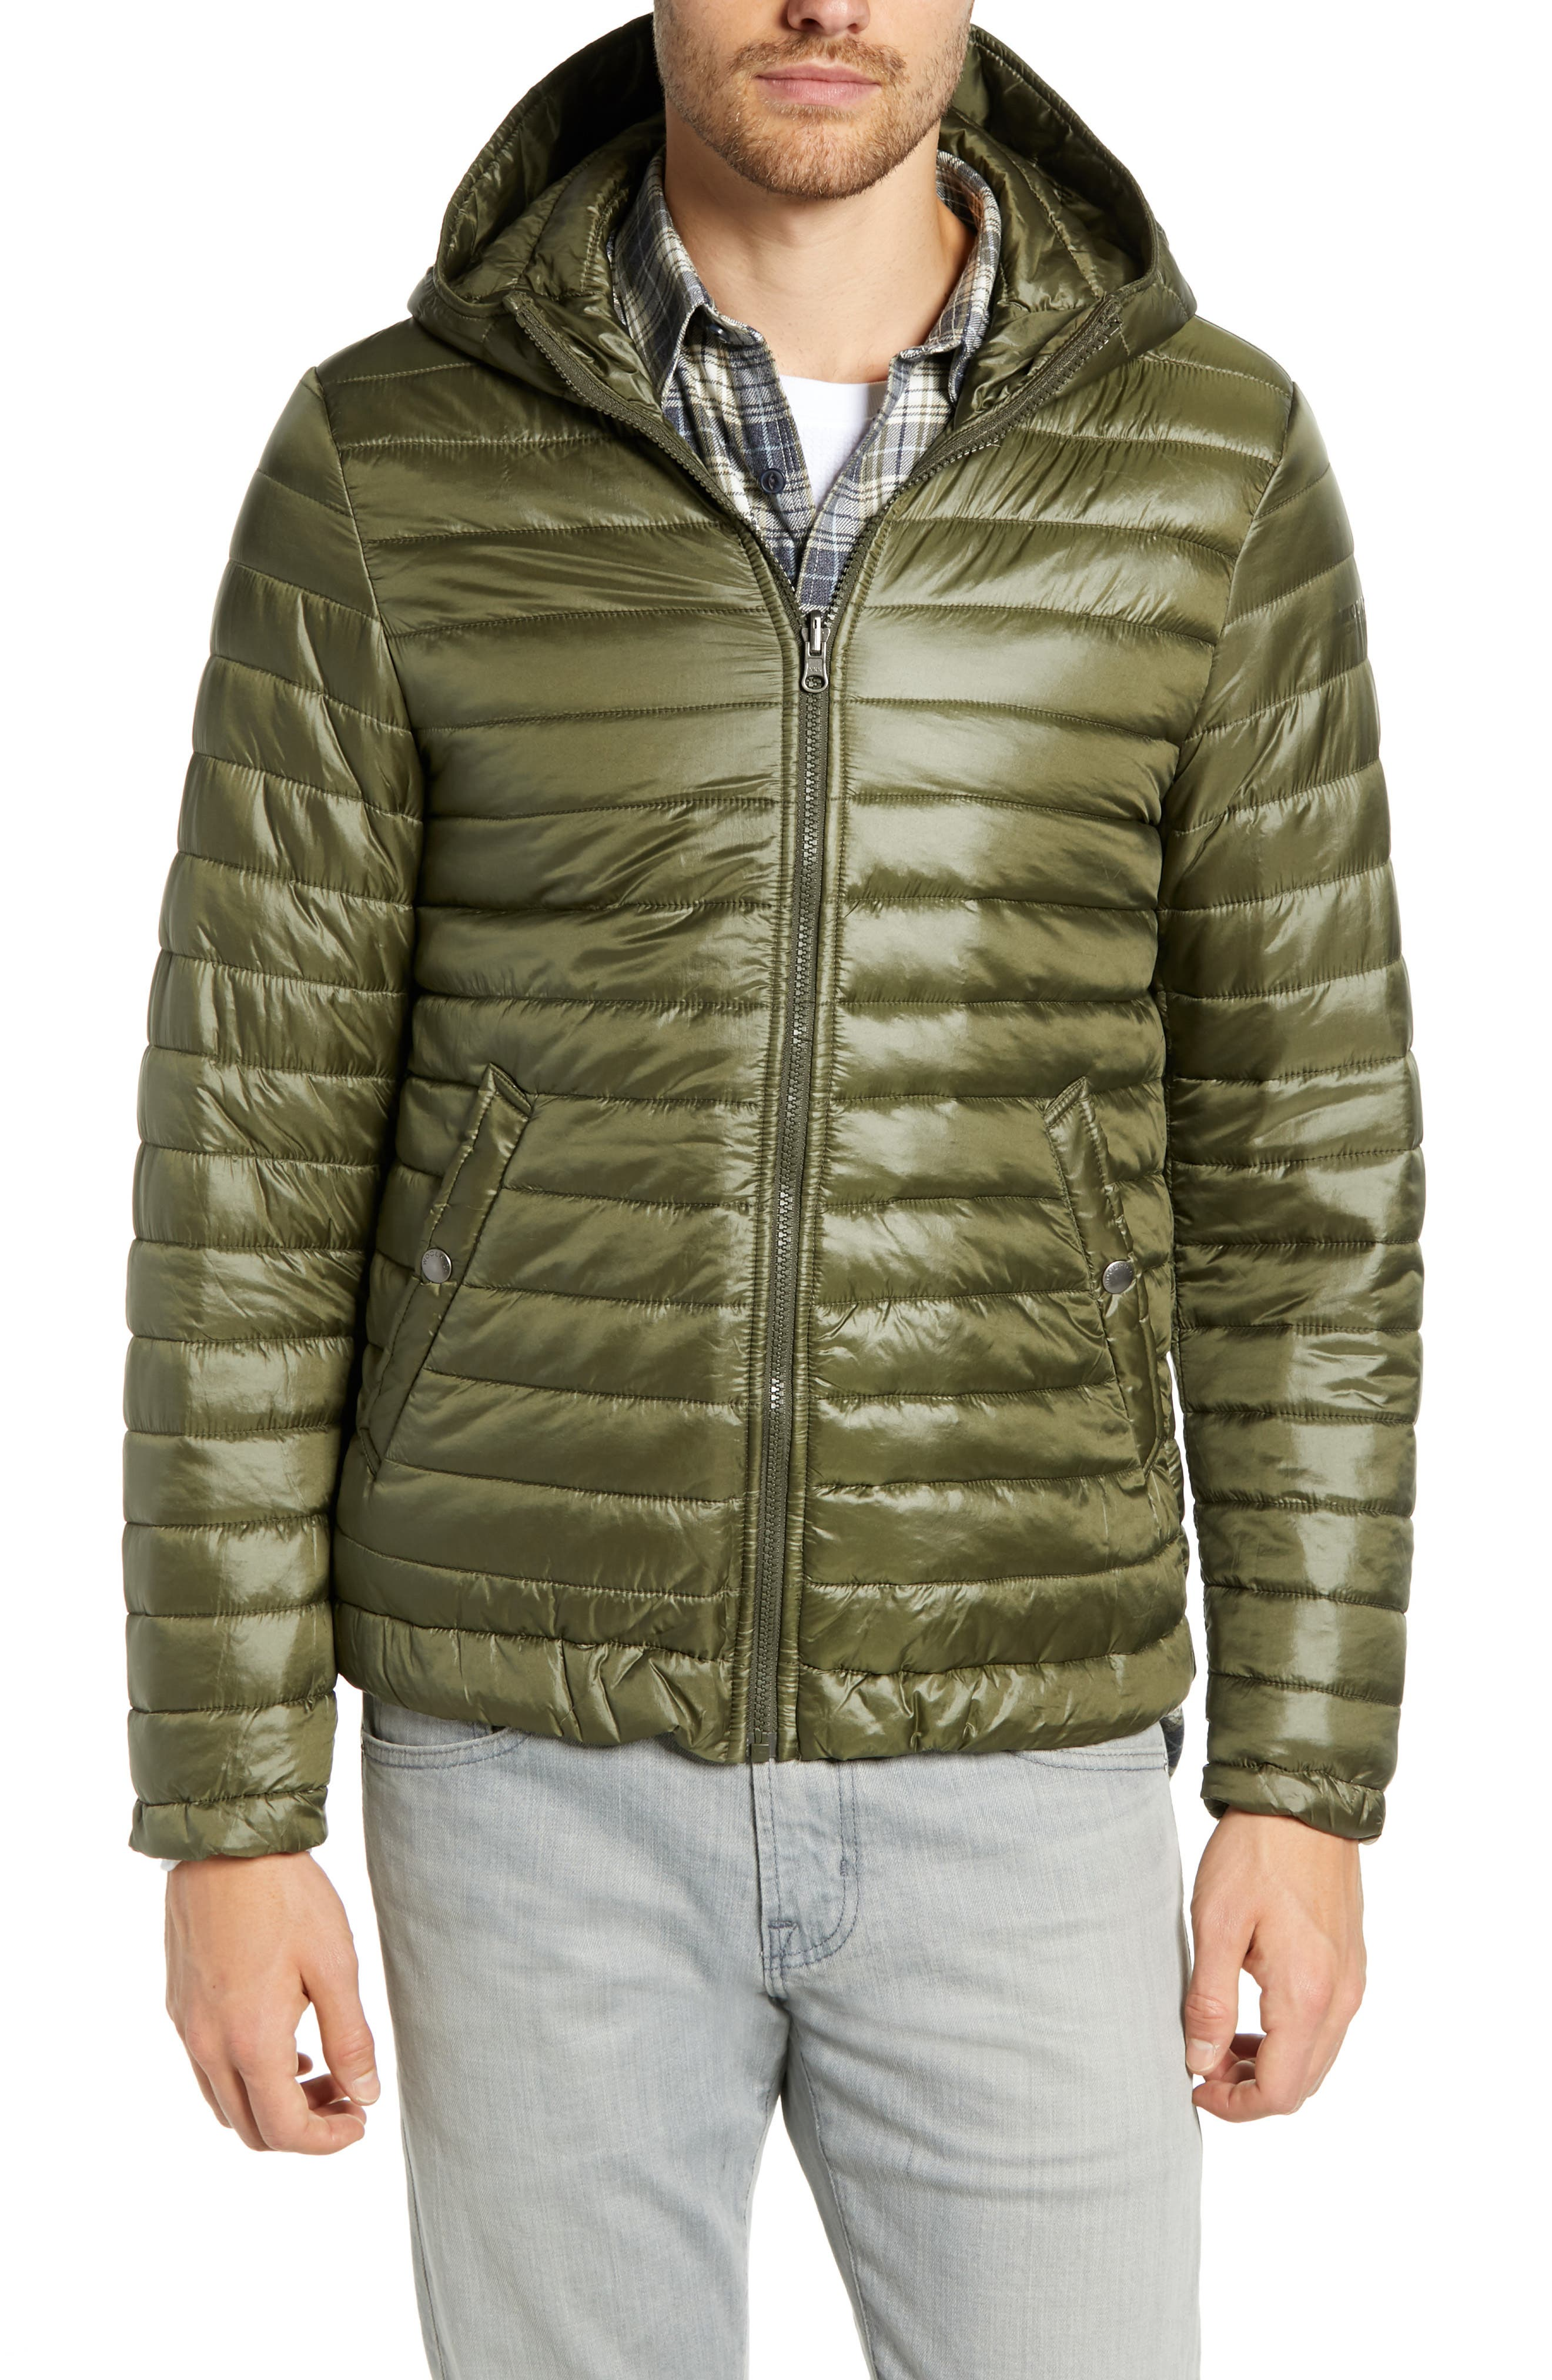 John Rich 'Long Military Eskimo' 3-in-1 Hooded Jacket,                             Alternate thumbnail 2, color,                             FLINT OLIVE